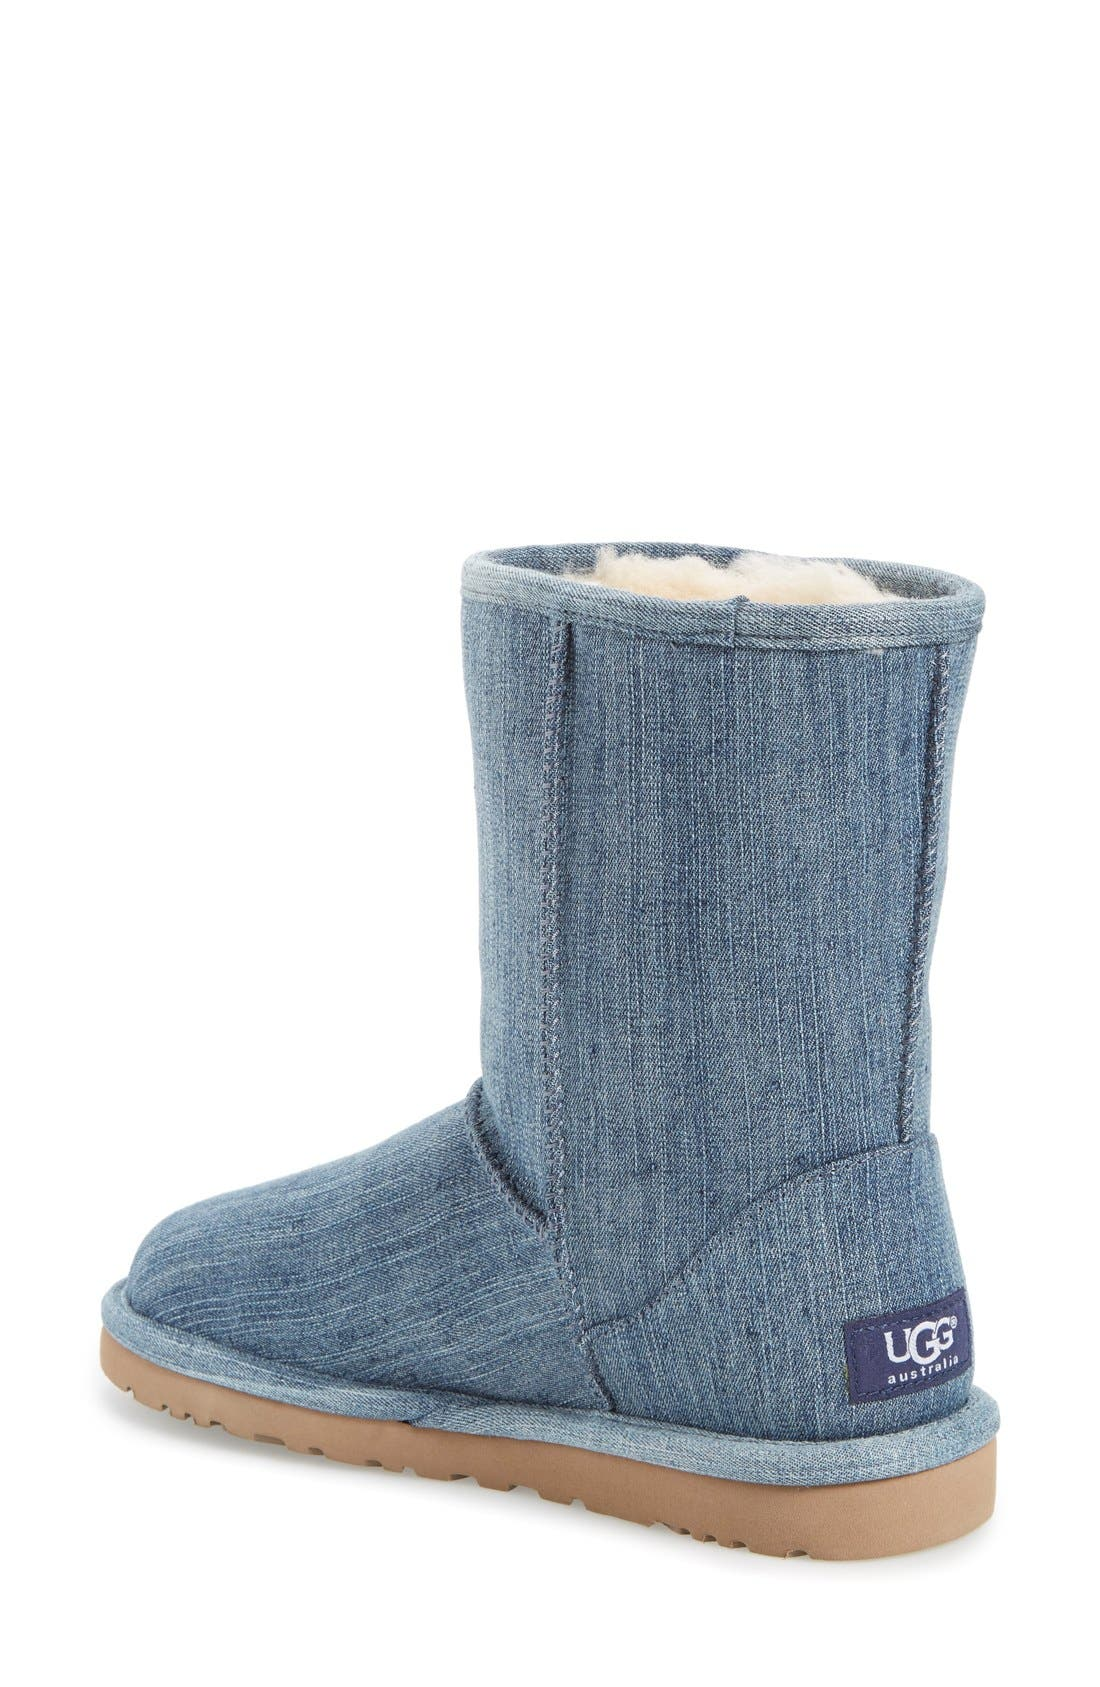 Alternate Image 2  - UGG® 'Classic Short' Denim Boot (Women)